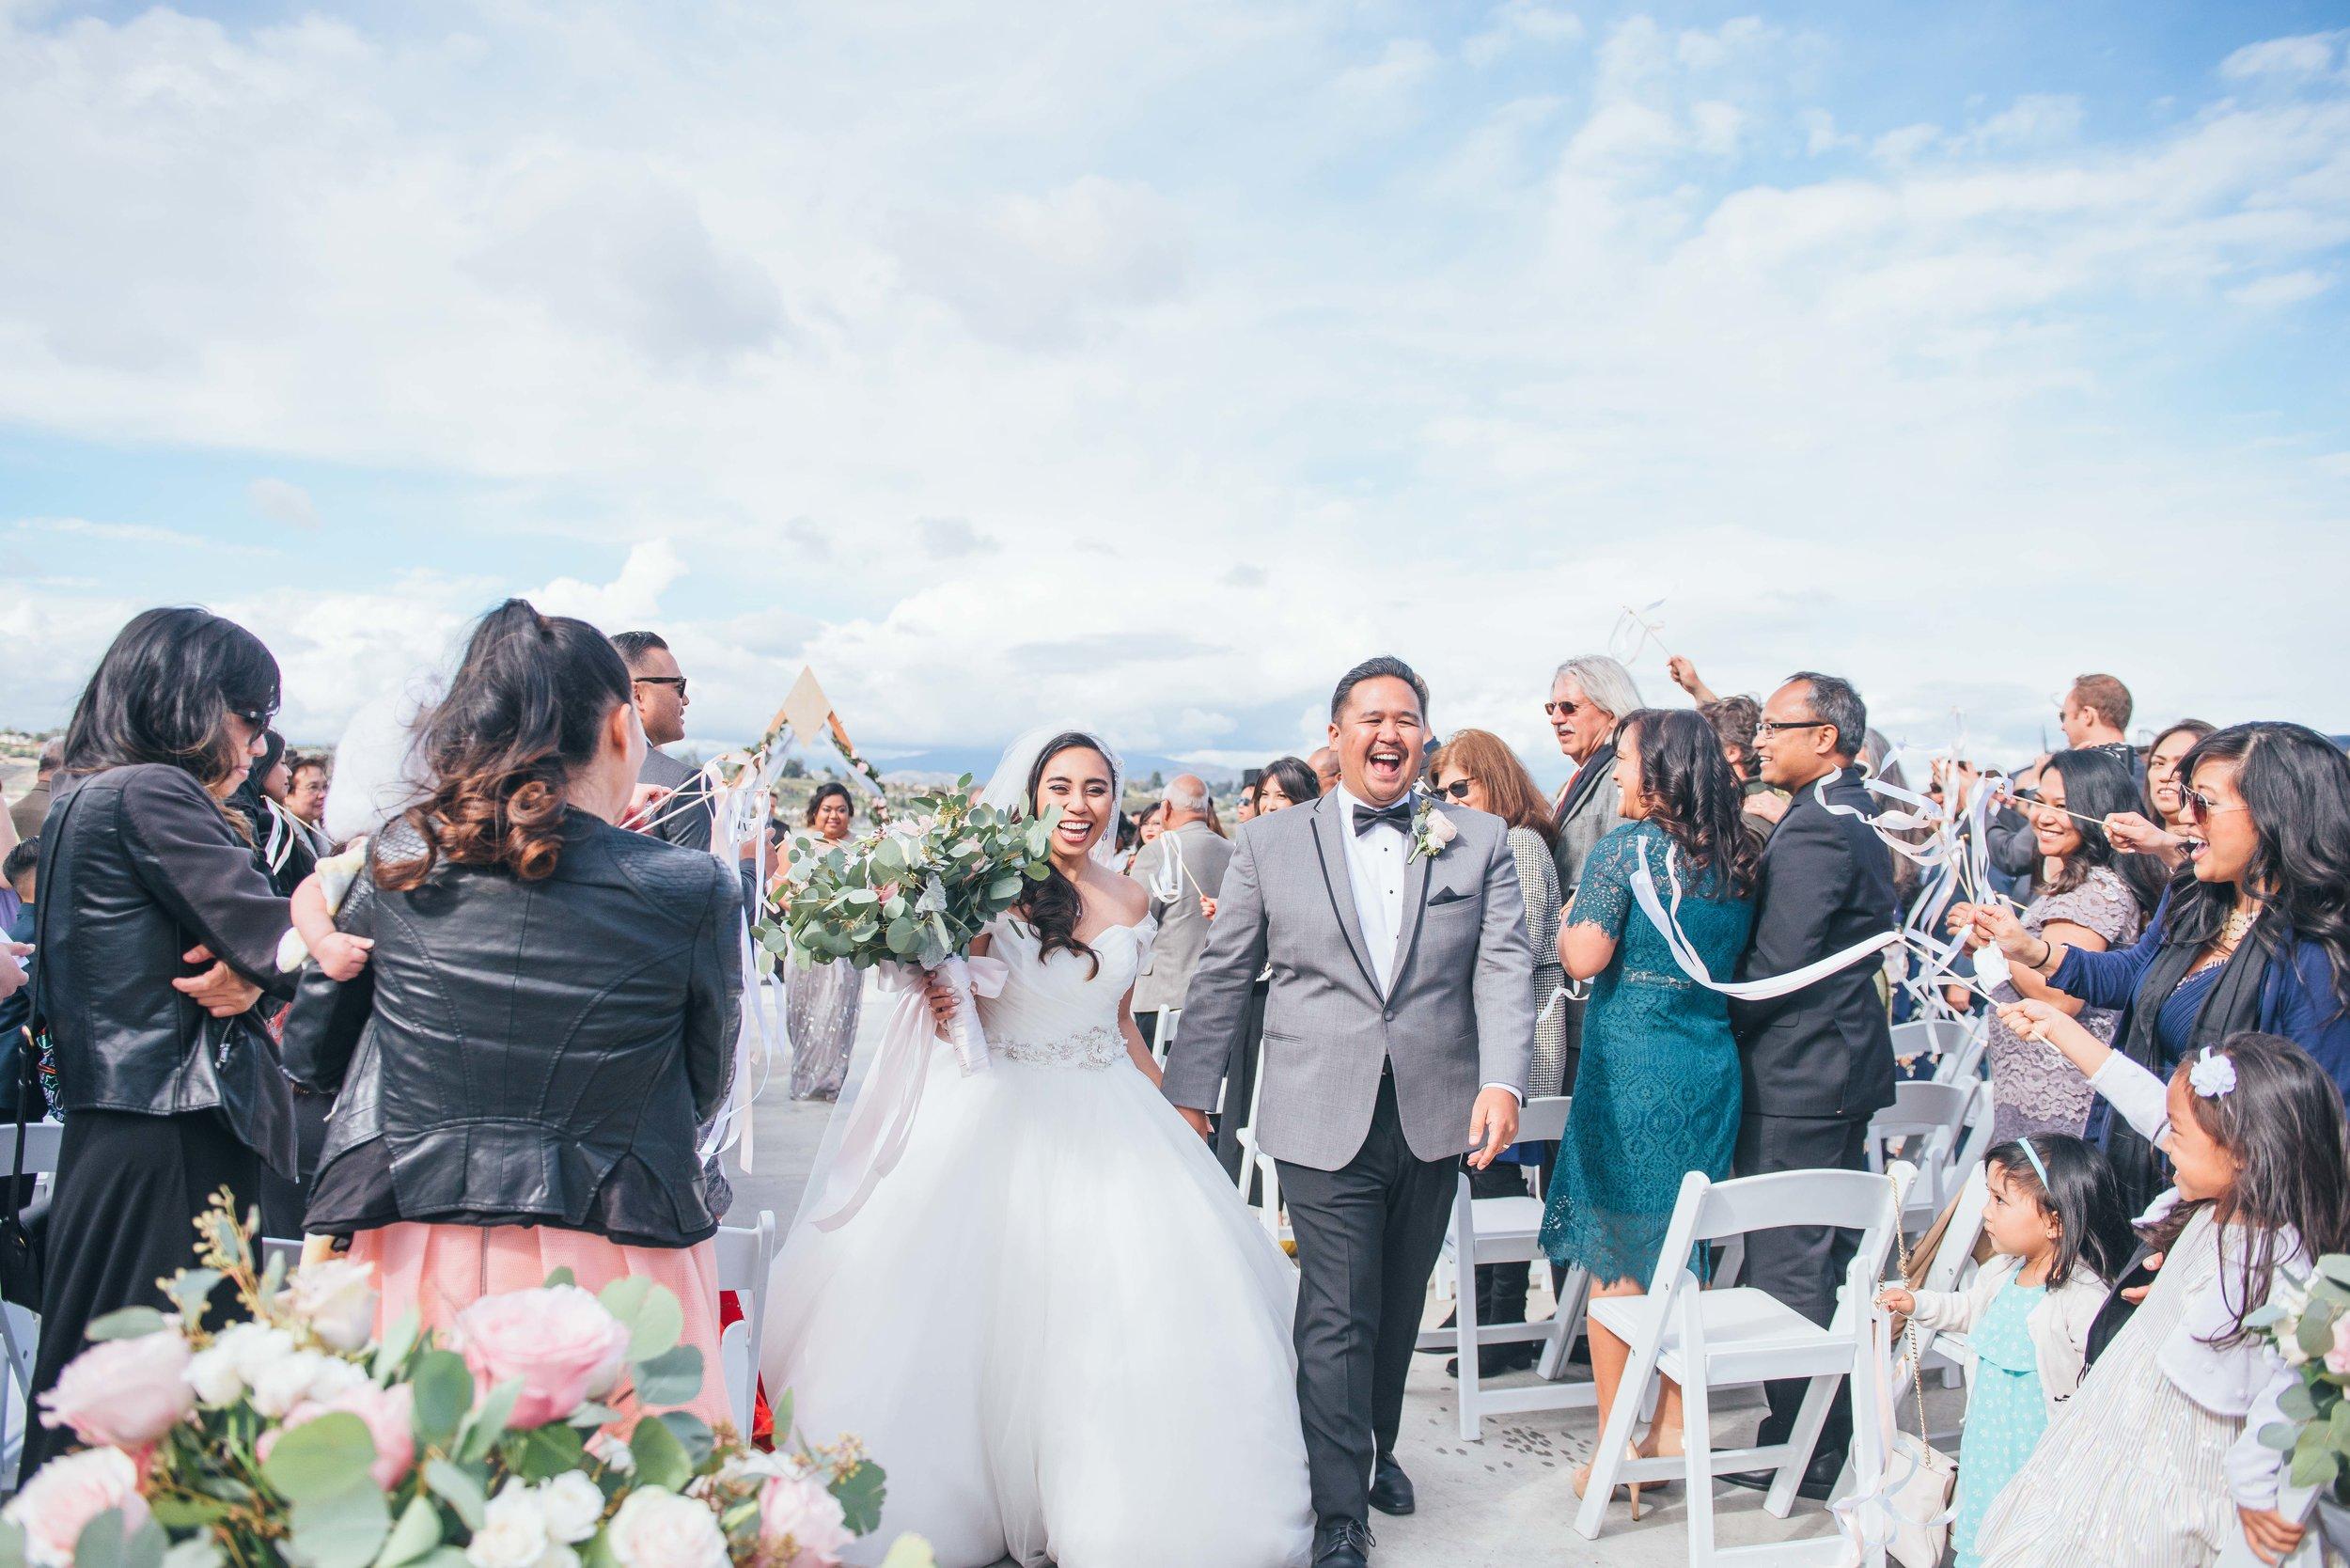 Hangar Events, Camarillo Wedding Photographer, Elopement Photographer, Engagement Photographer, Los Angeles Wedding Photographer, Palm Springs Wedding Photographer, Joshua Tree Wedding Photographer